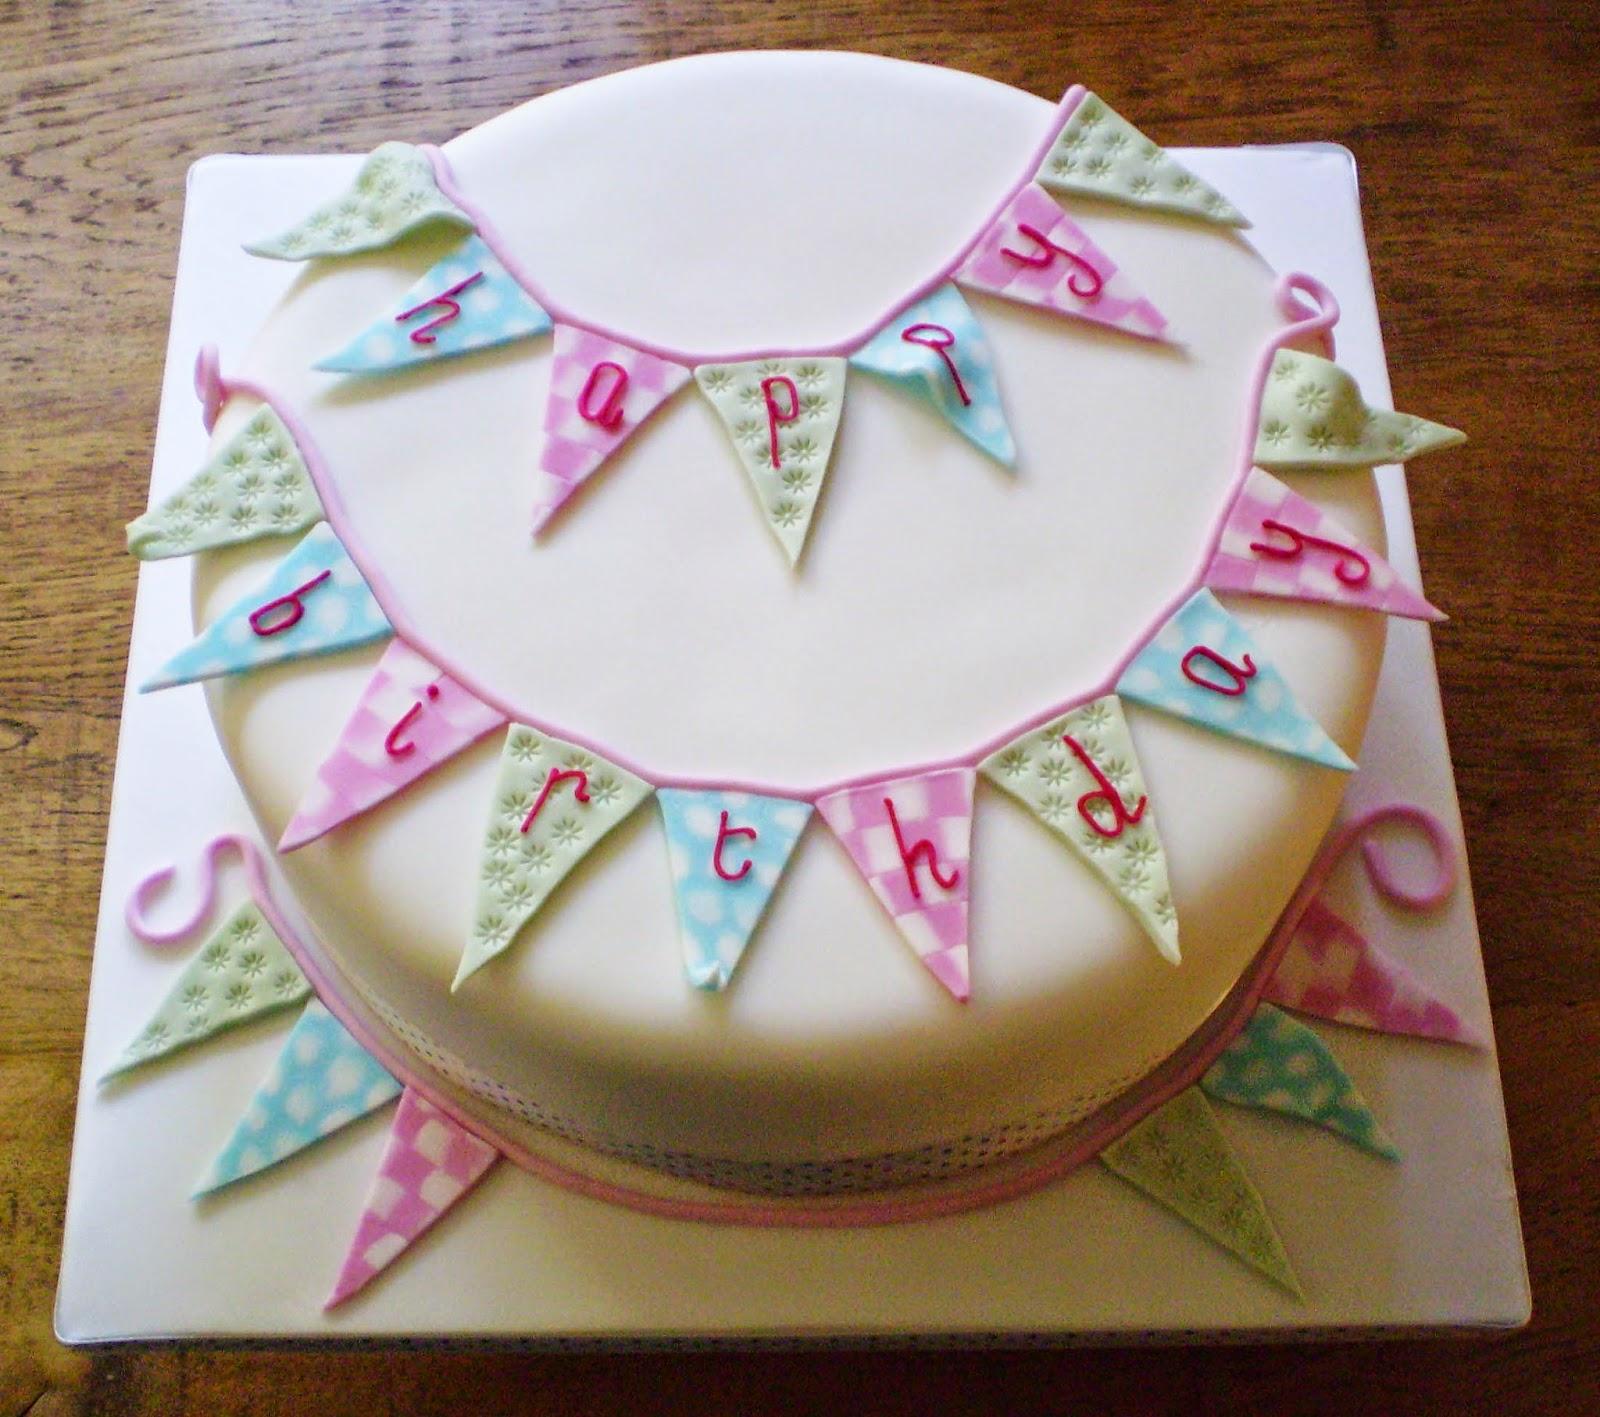 Badone Wishes For Happy Birthday Cake Hd